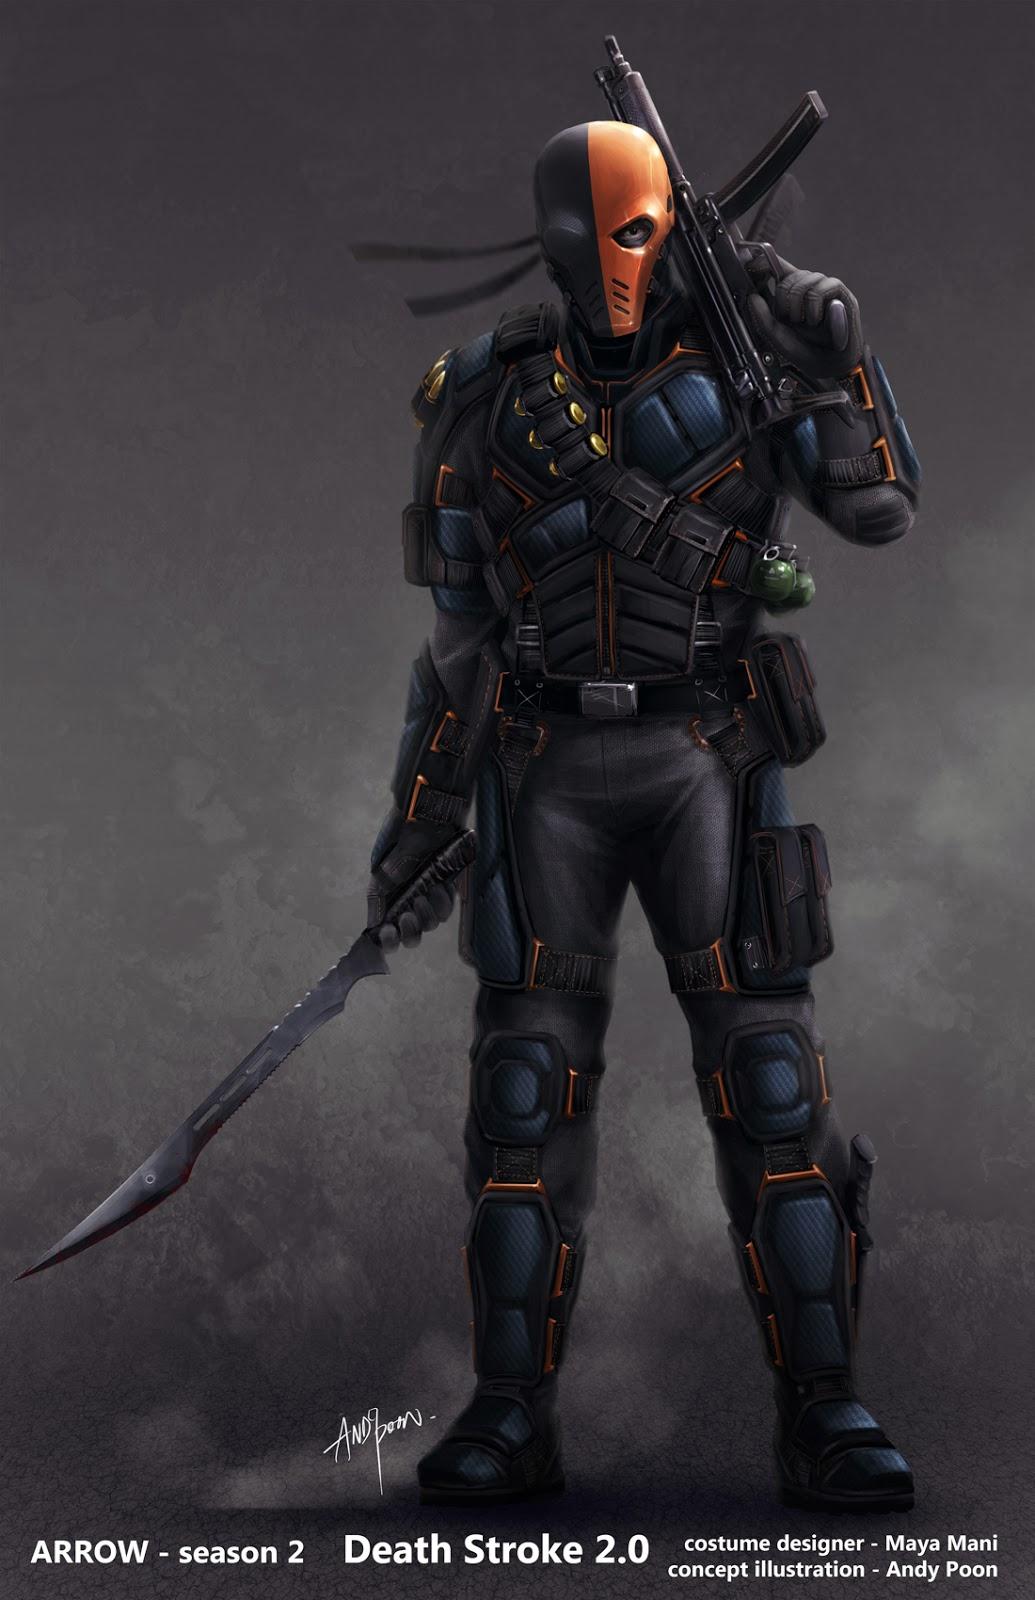 Arquivo:Deathstroke concept art season 2.png